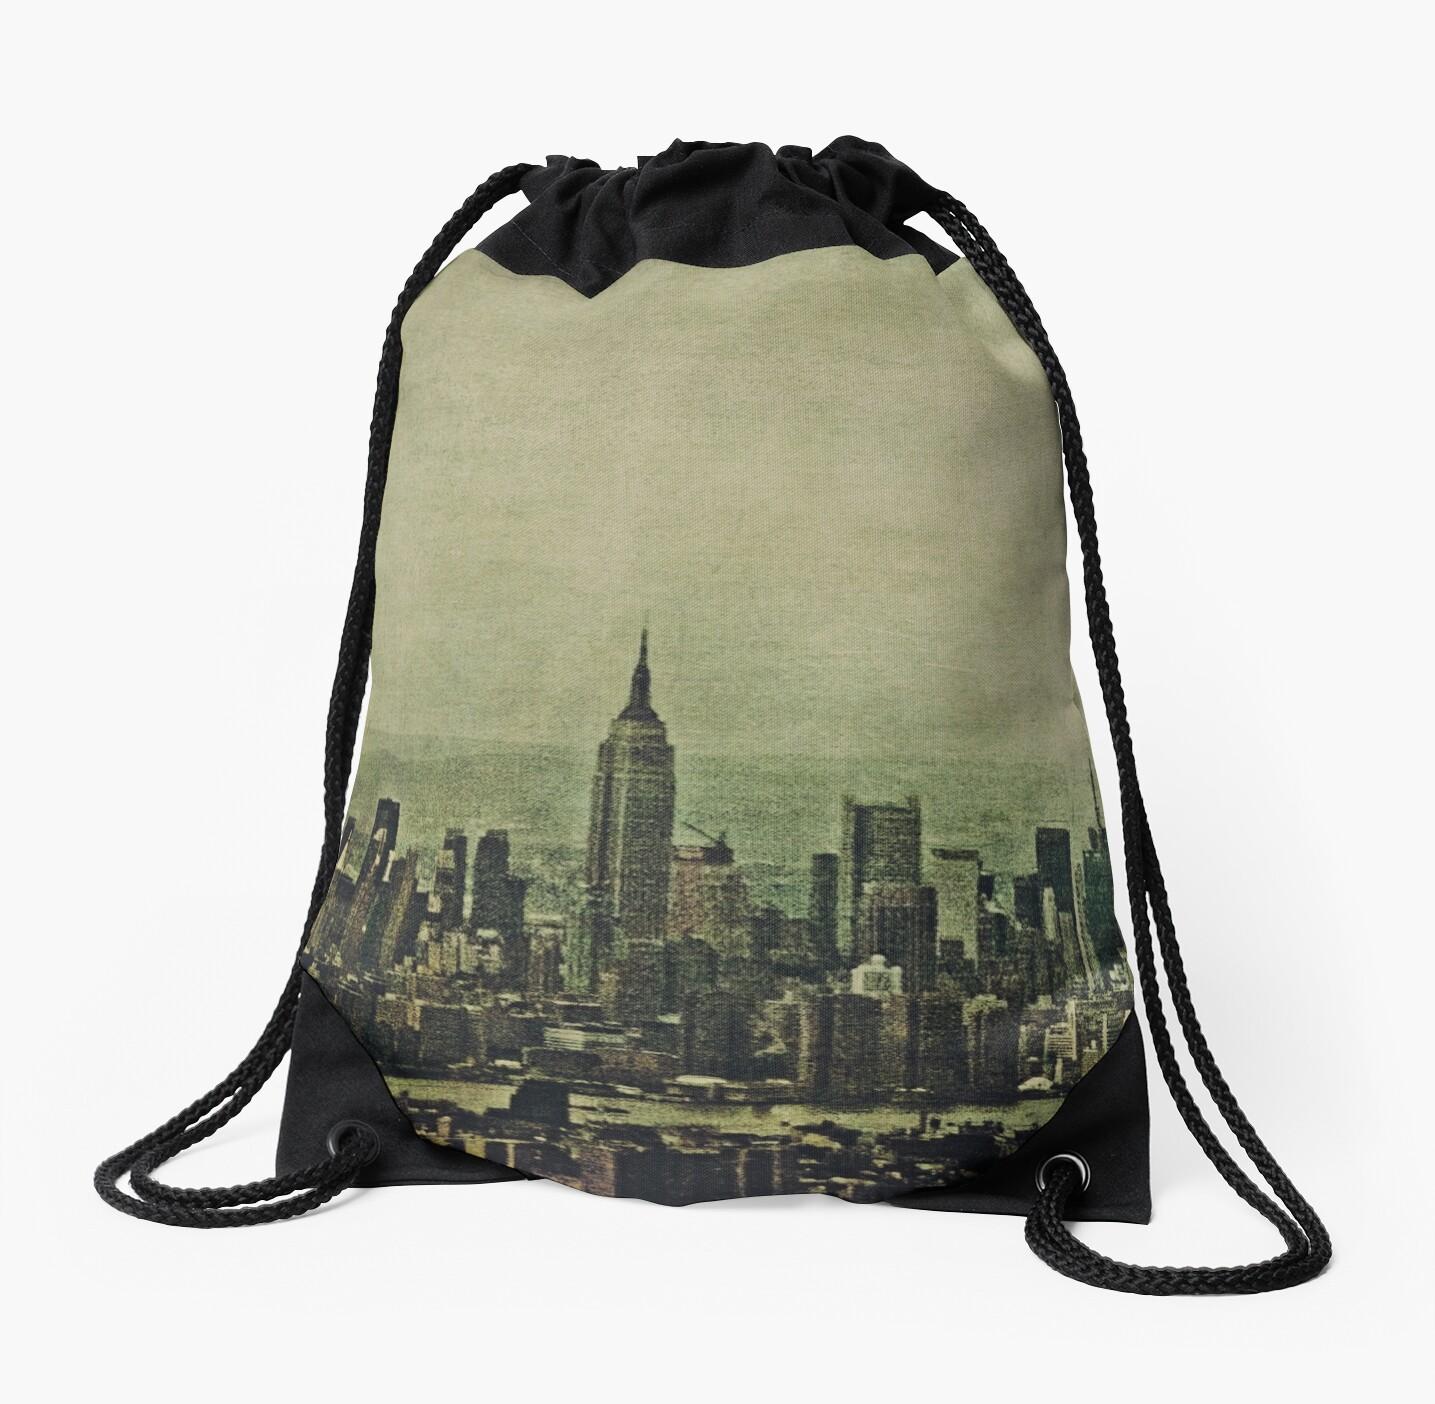 New York by tori yule